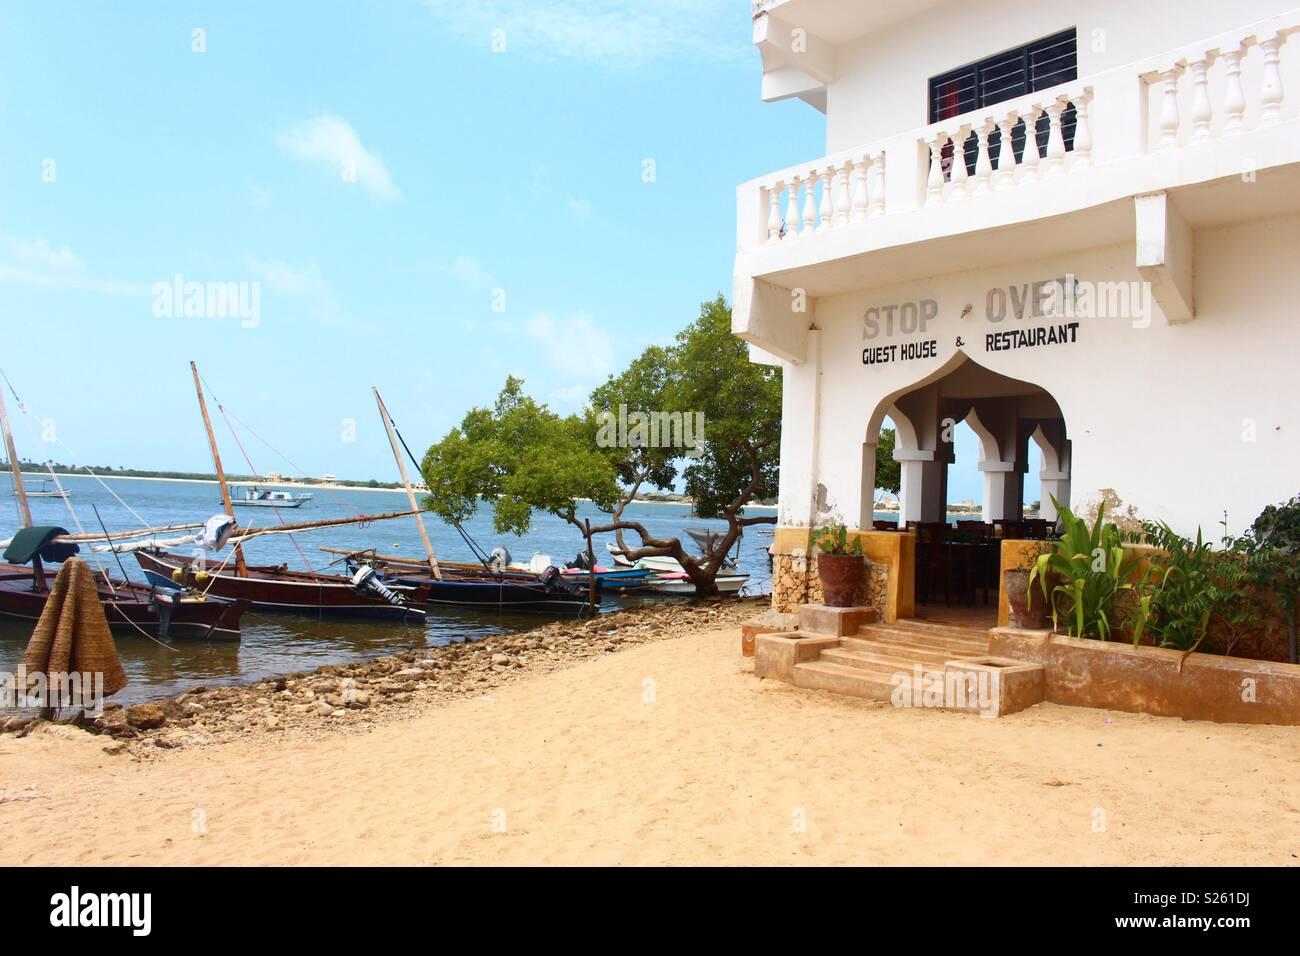 The beach outside stop over guest house at Shela, Lamu Island, Kenya - Stock Image